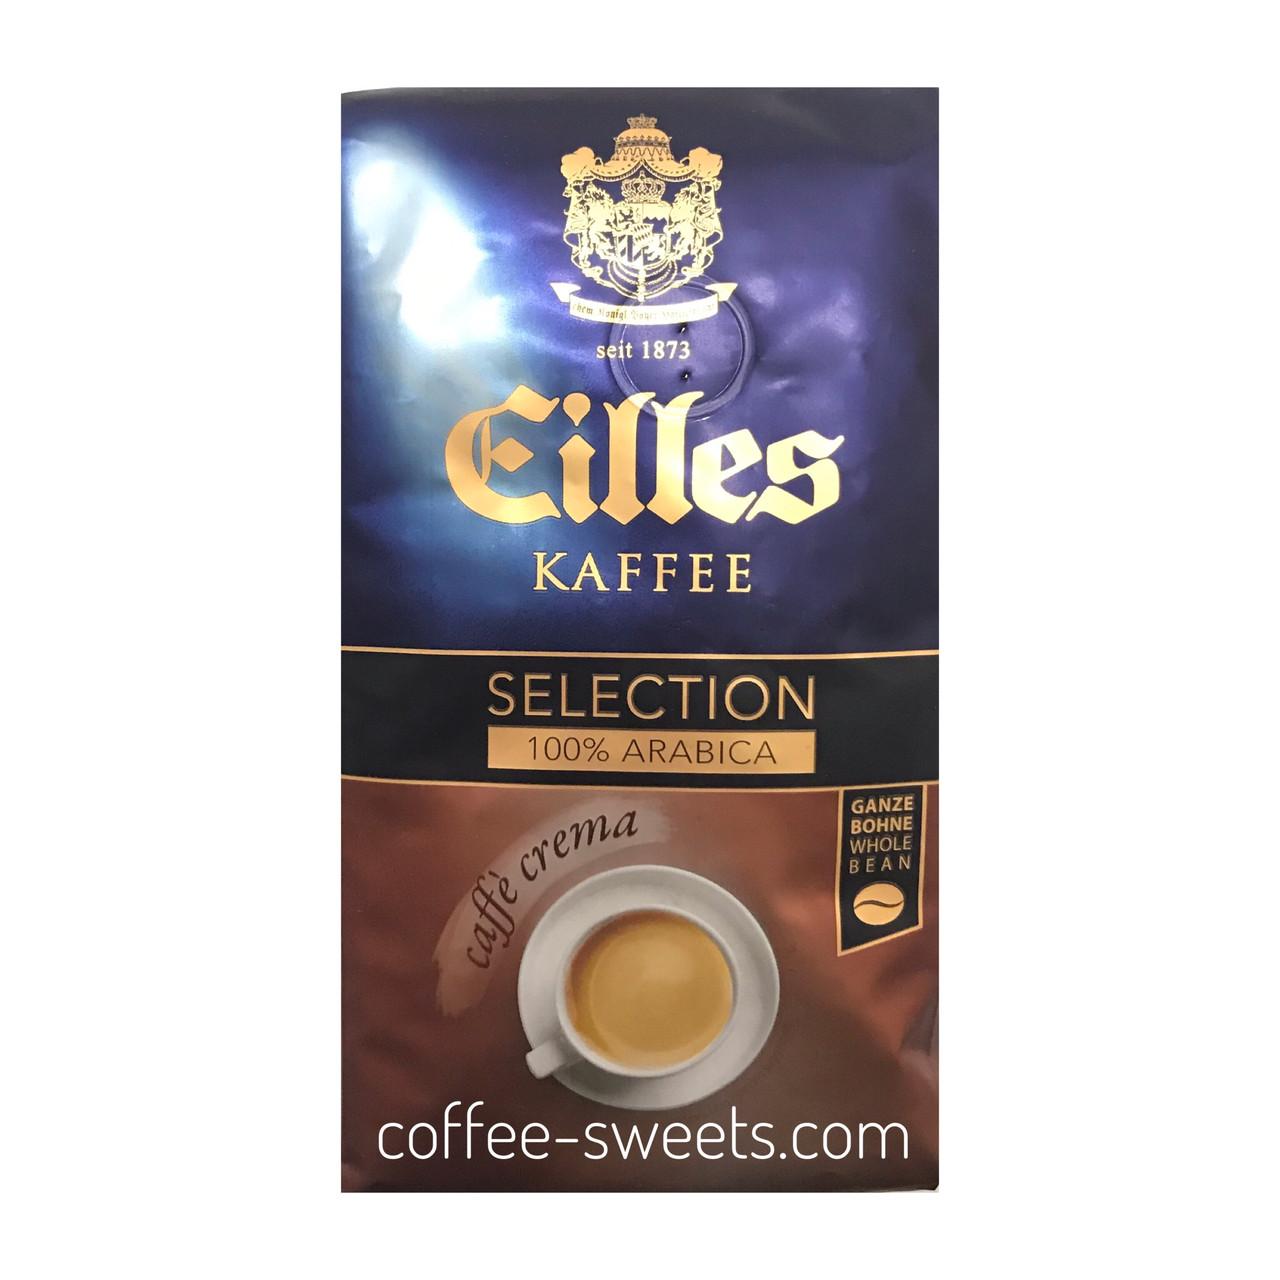 Кава зернова J. J. Darboven EILLES Selection Caffe Crema Арабіка 100% 1 кг.